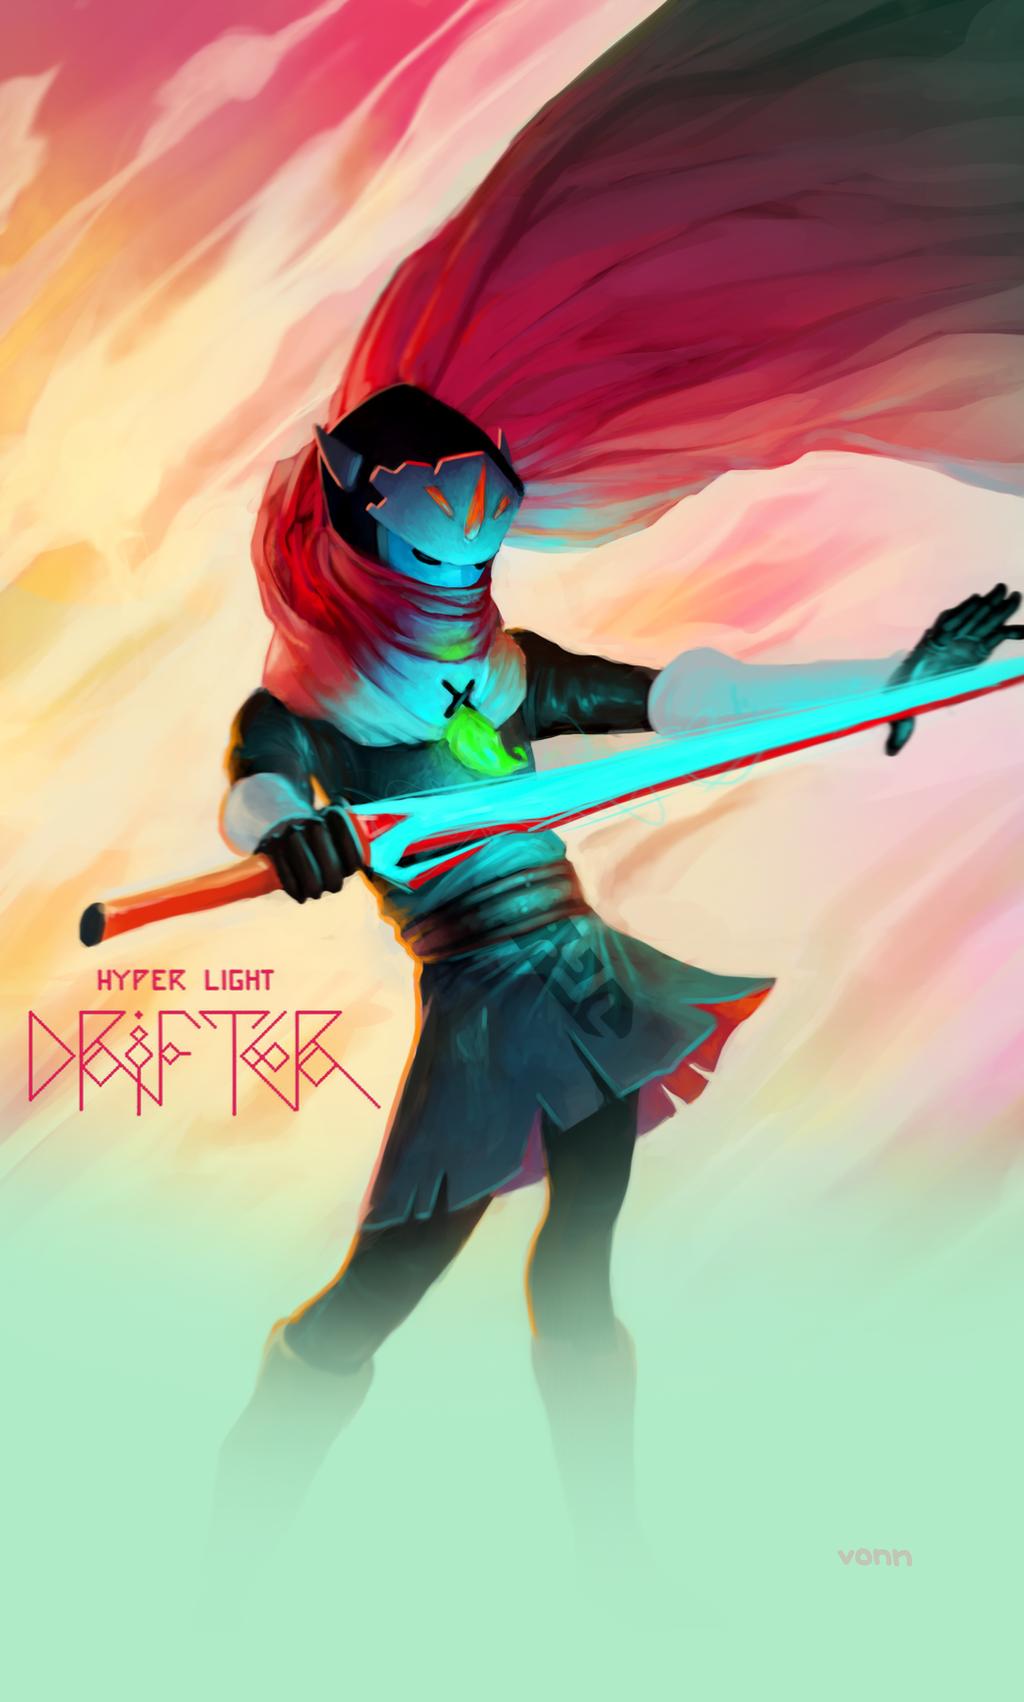 Hyper Light Drifter Fan Art by Tvonn9